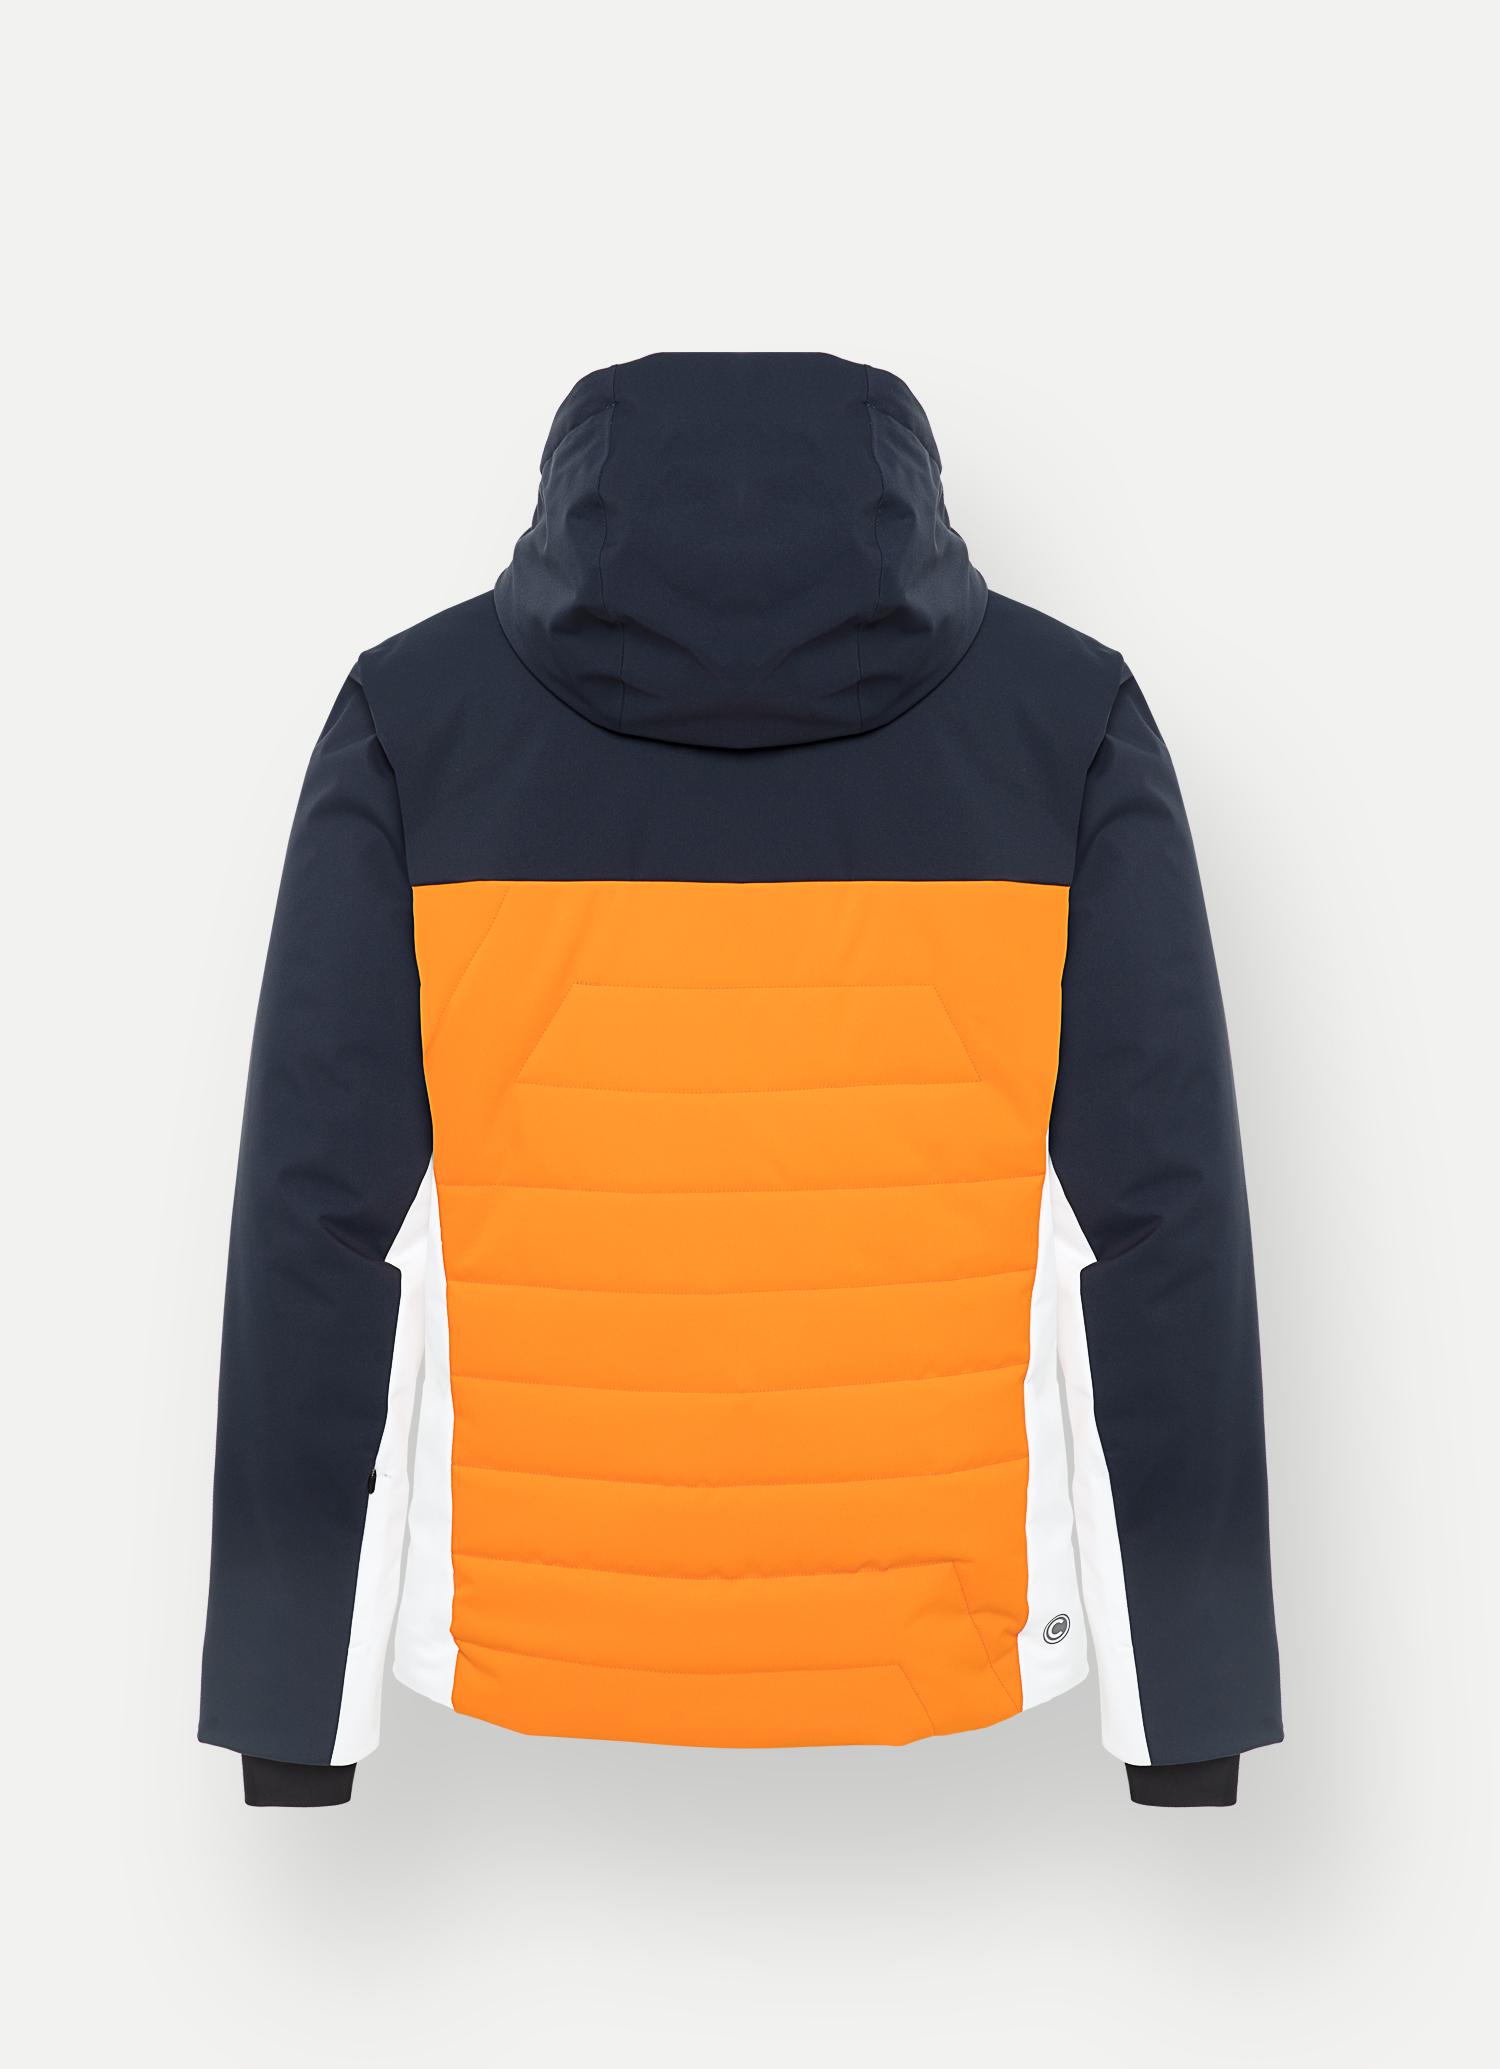 Colmar Ski KANDAHAR men's jacket with a 15,000 WPT rating